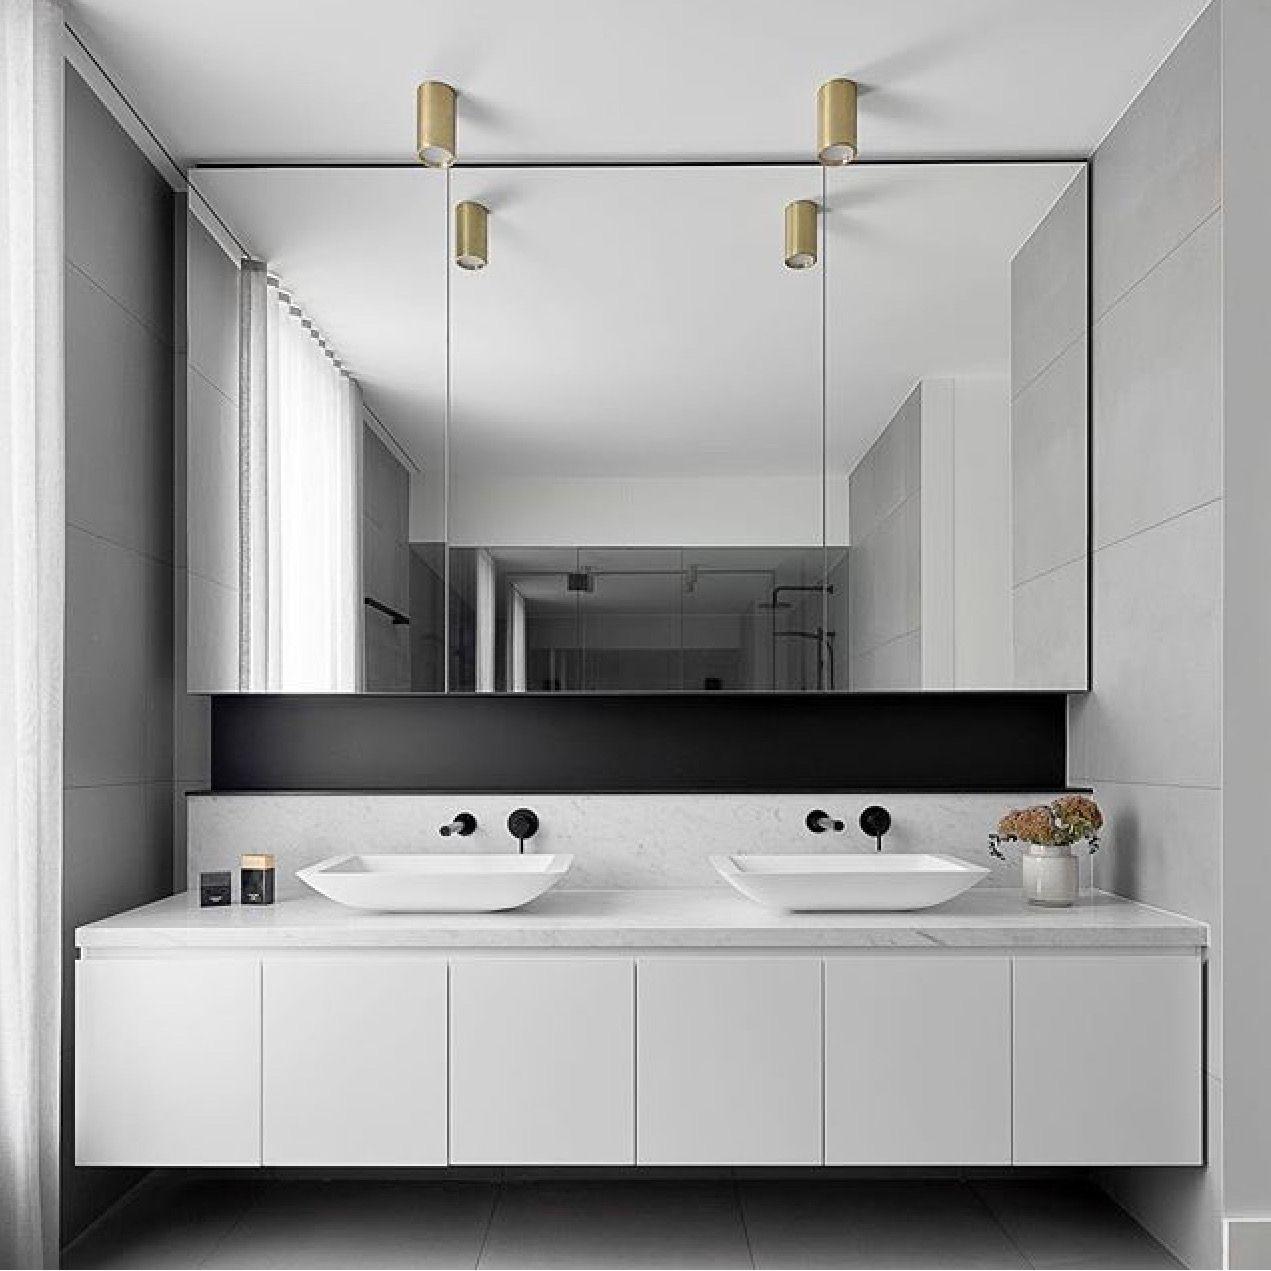 Modern Minimalist Bathroom Design: Modern Bathroom Basin Area. Bathroom